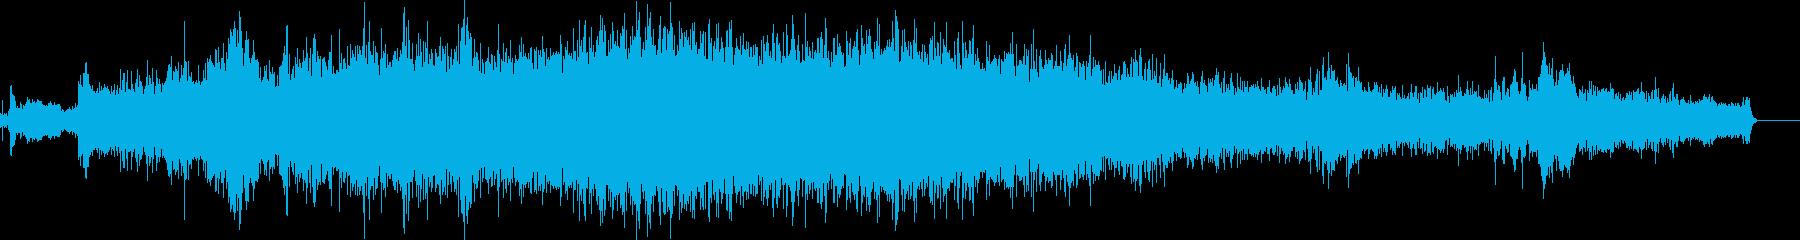 CAR、VAN V8、RIDE、F...の再生済みの波形